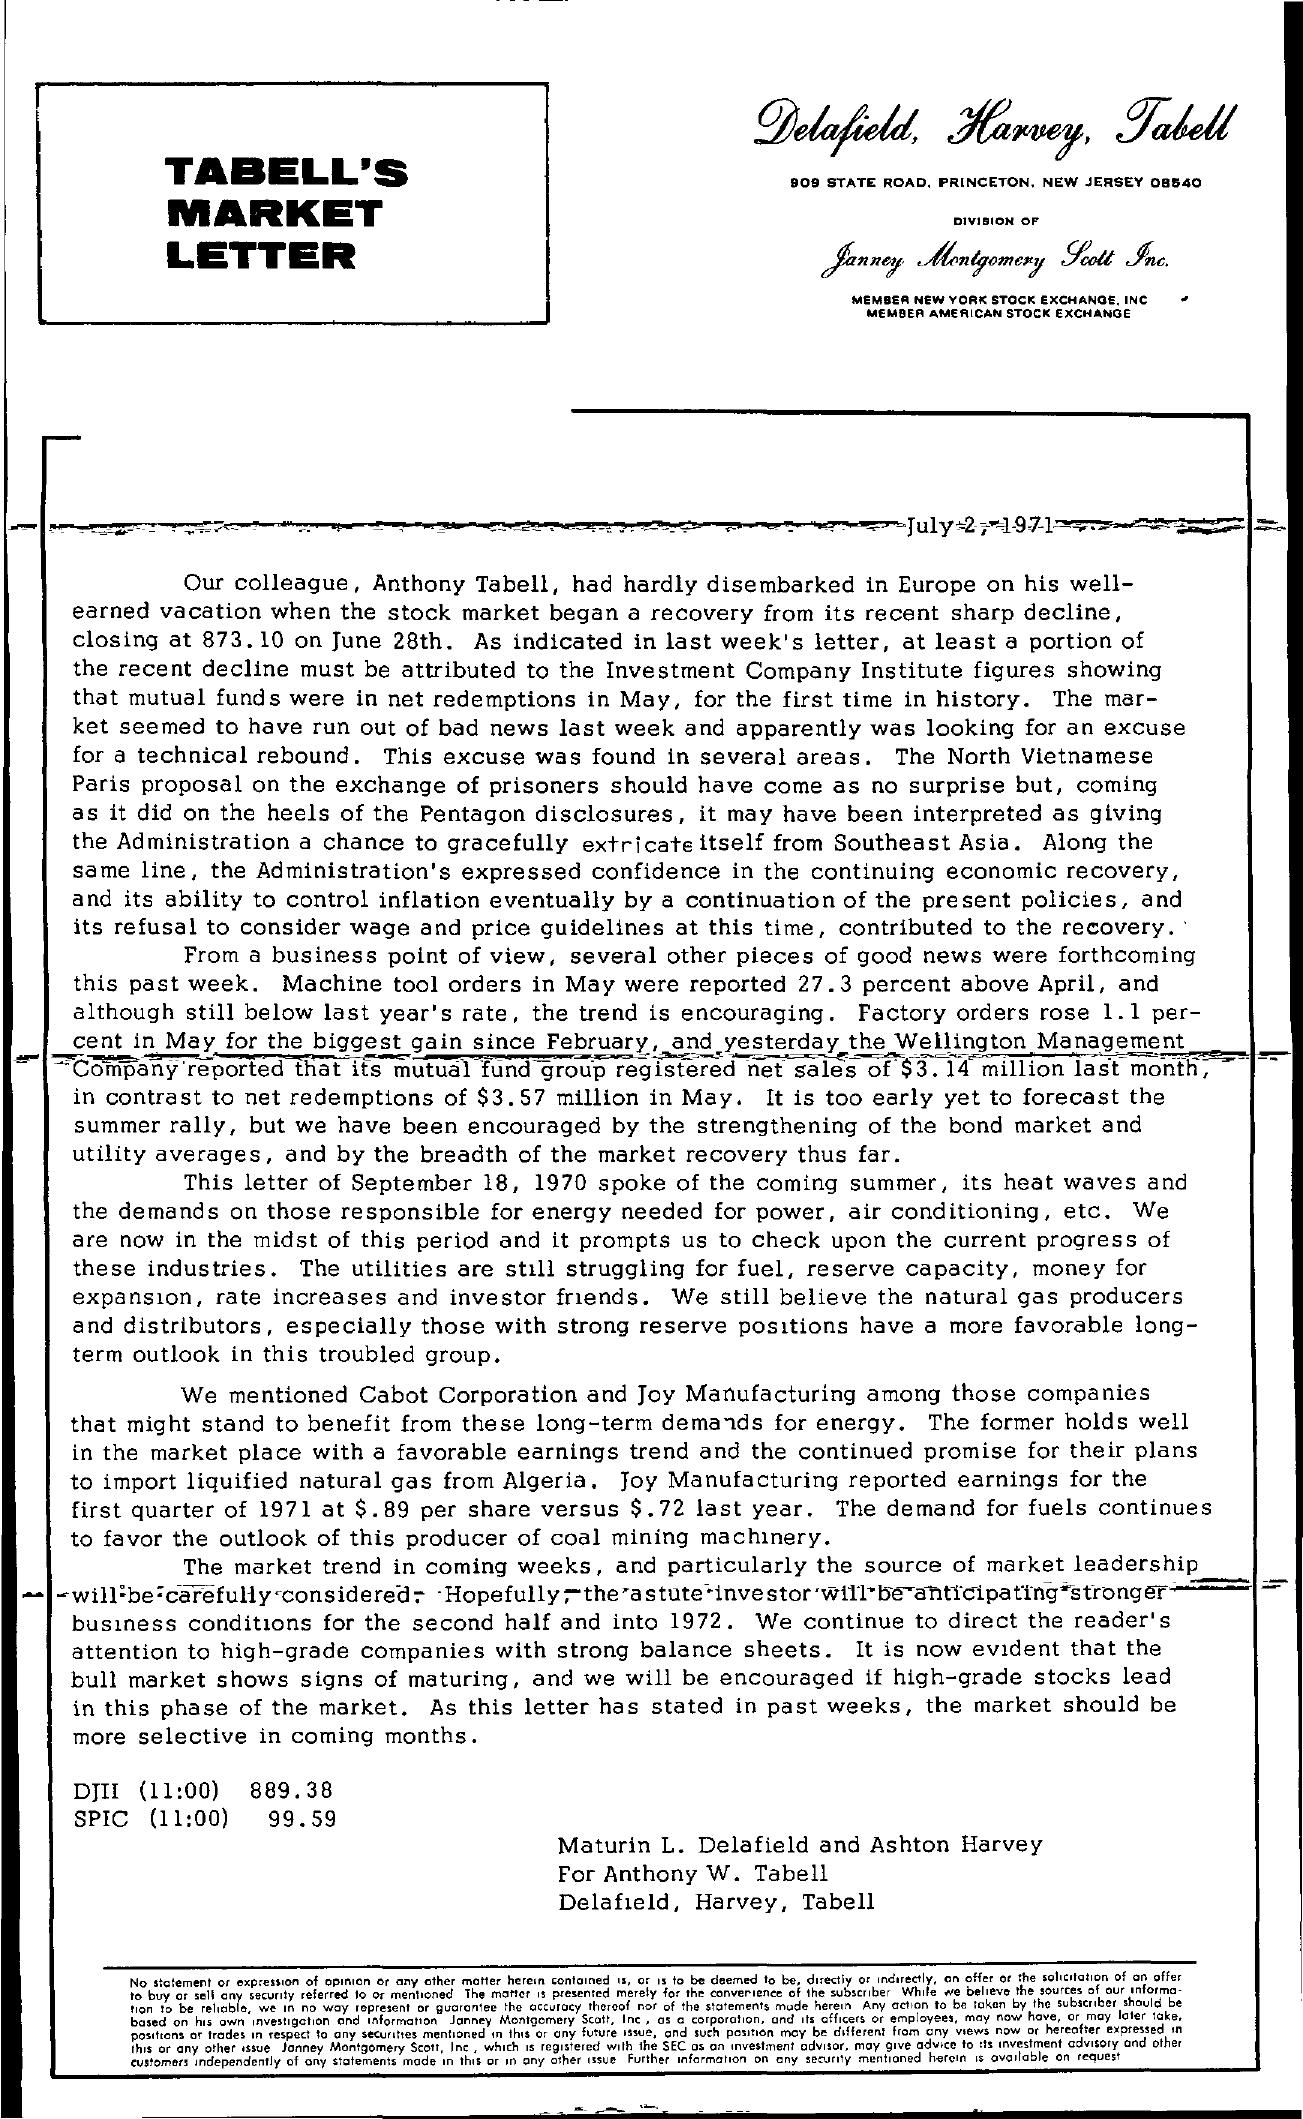 Tabell's Market Letter - July 02, 1971